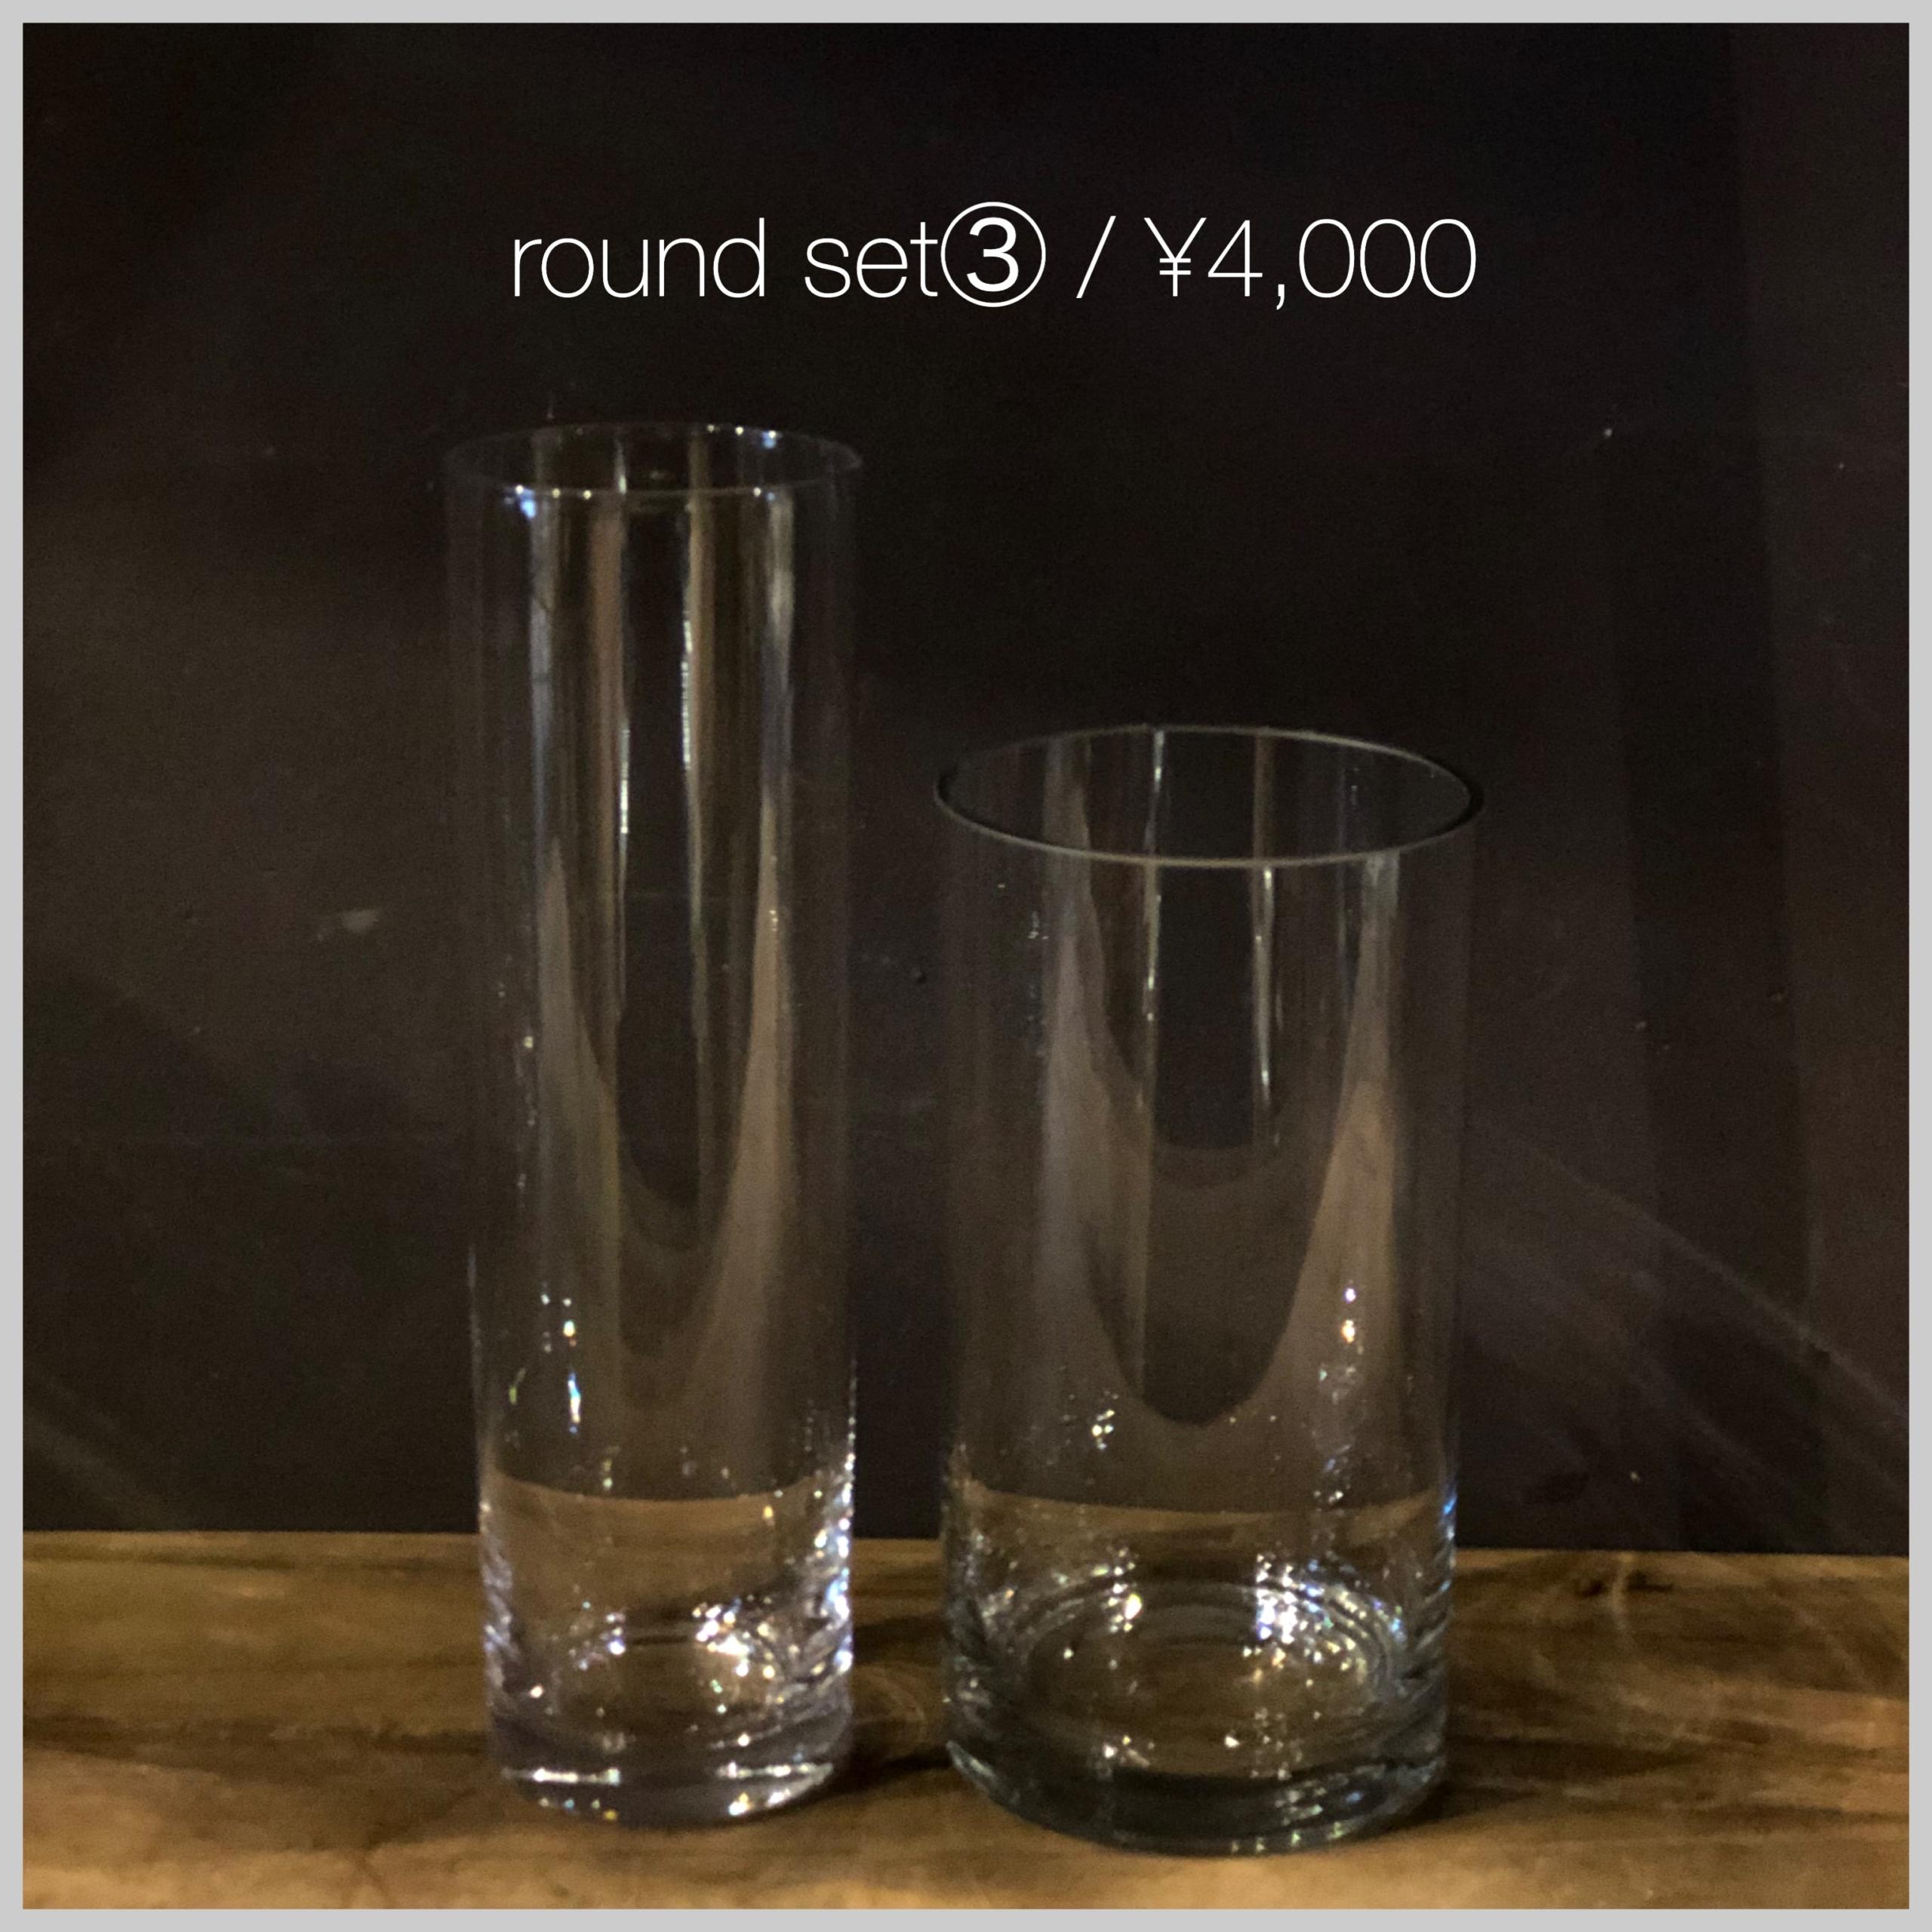 vase0005-roundset